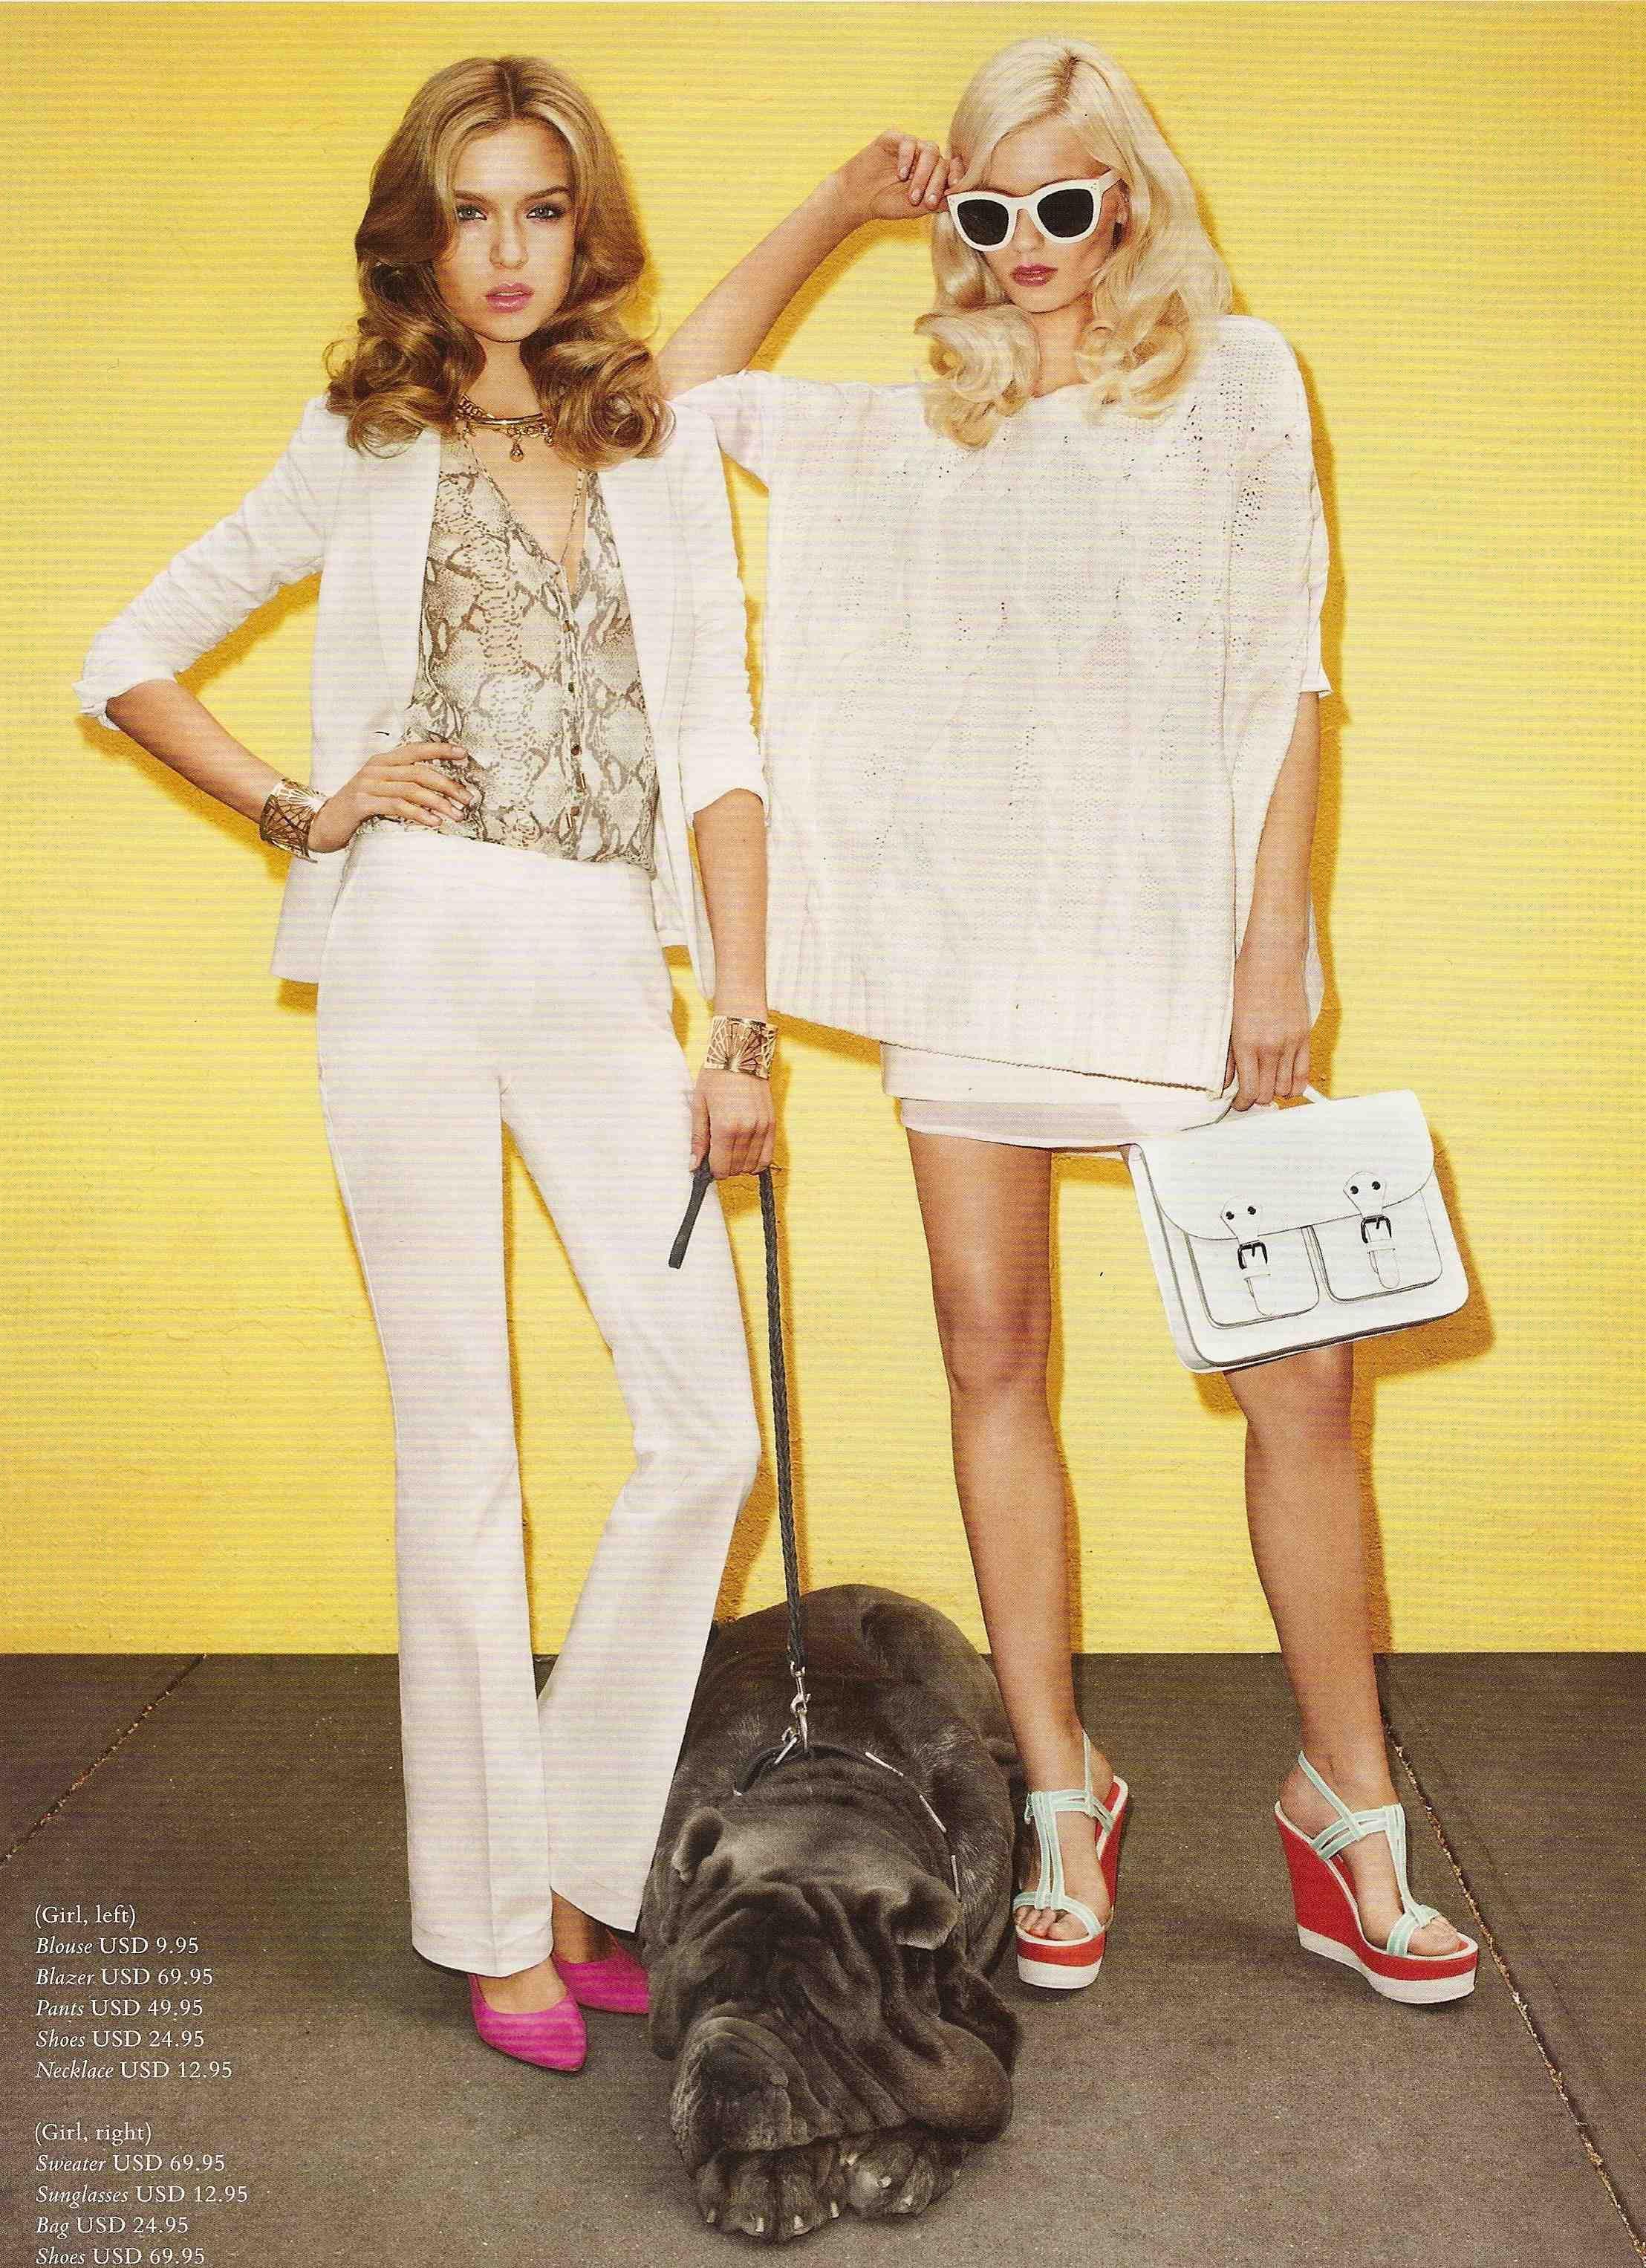 H&M Catalog   H&M Editorial   H&M   Fashion Editorial   Fashion   fashion photography   photography